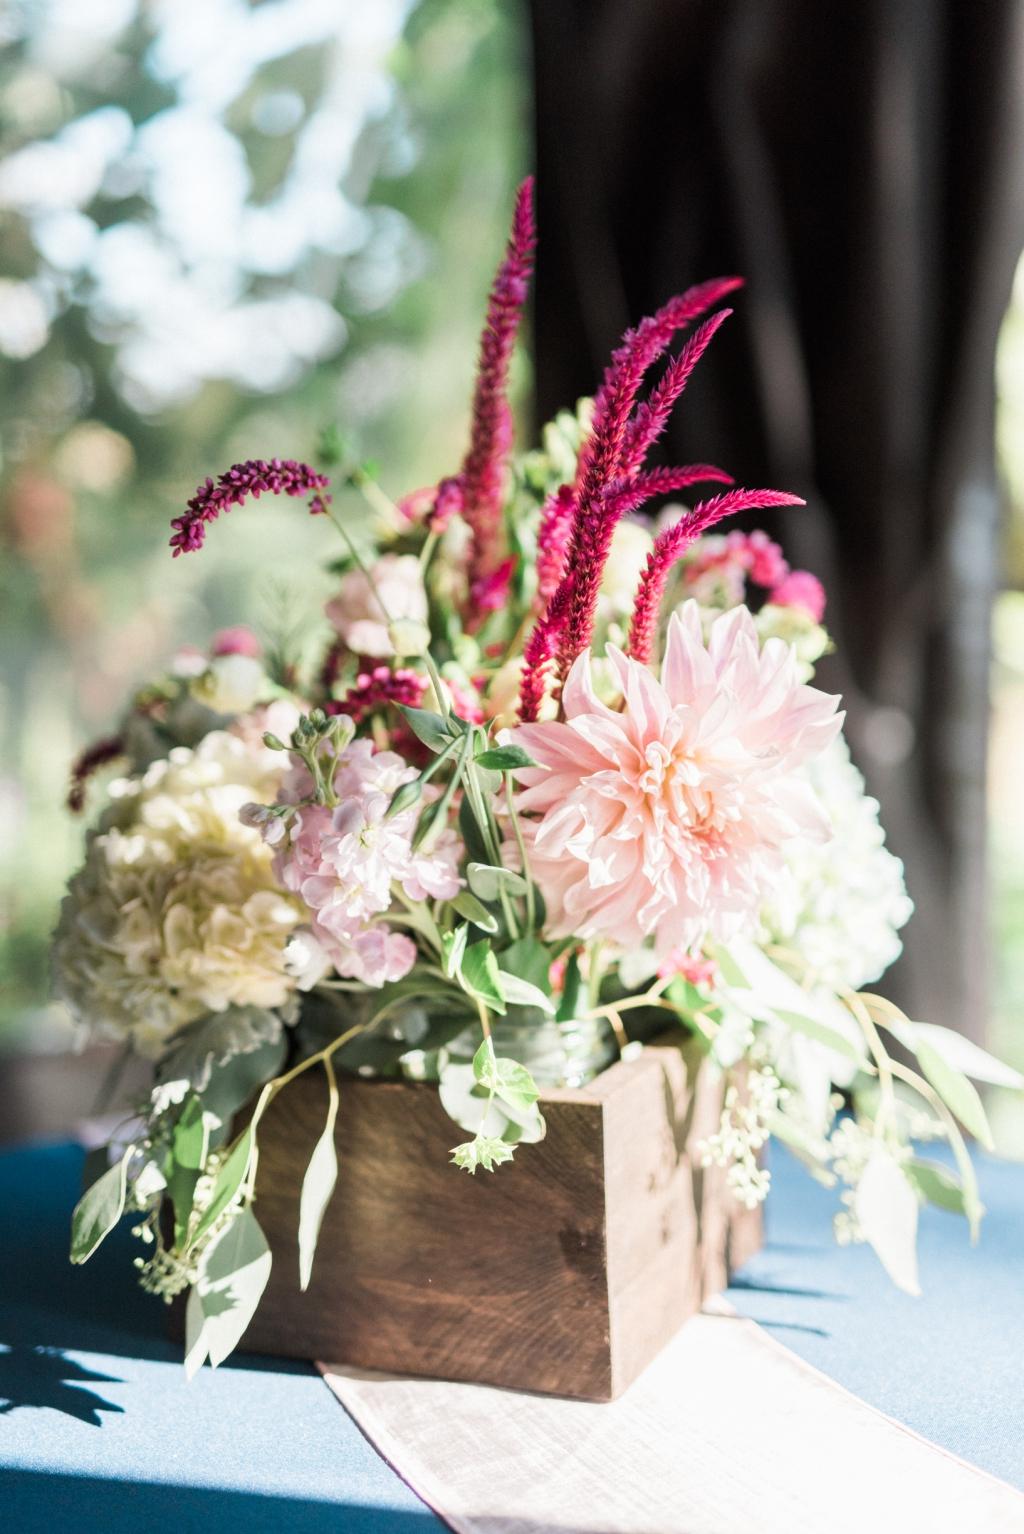 haley-richter-photography-buena-vista-confrence-center-wedding-summer-117